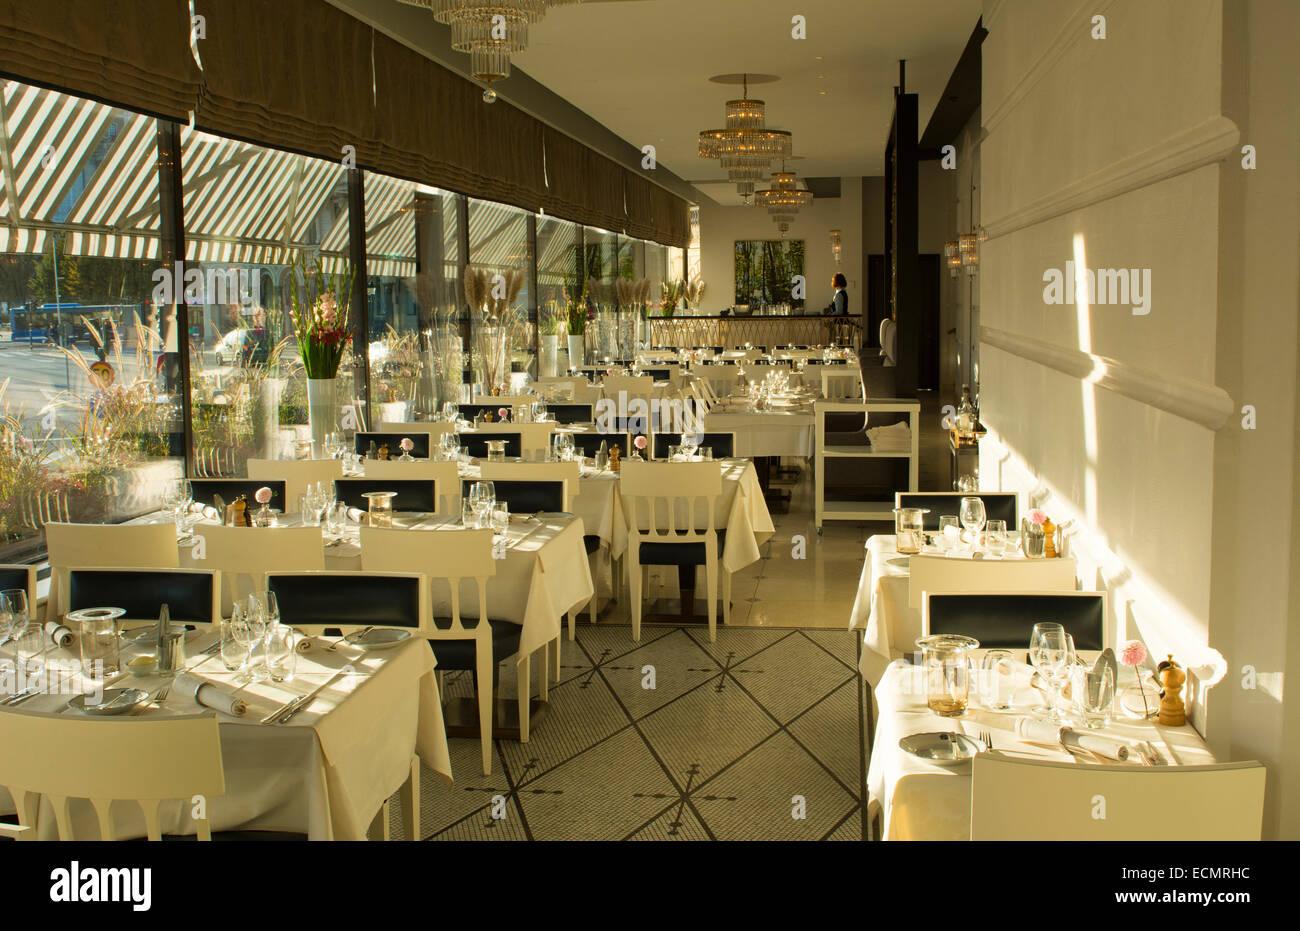 Stockholm Schweden Grand Hotel Verandan Restaurant Luxus Hotel Cafe